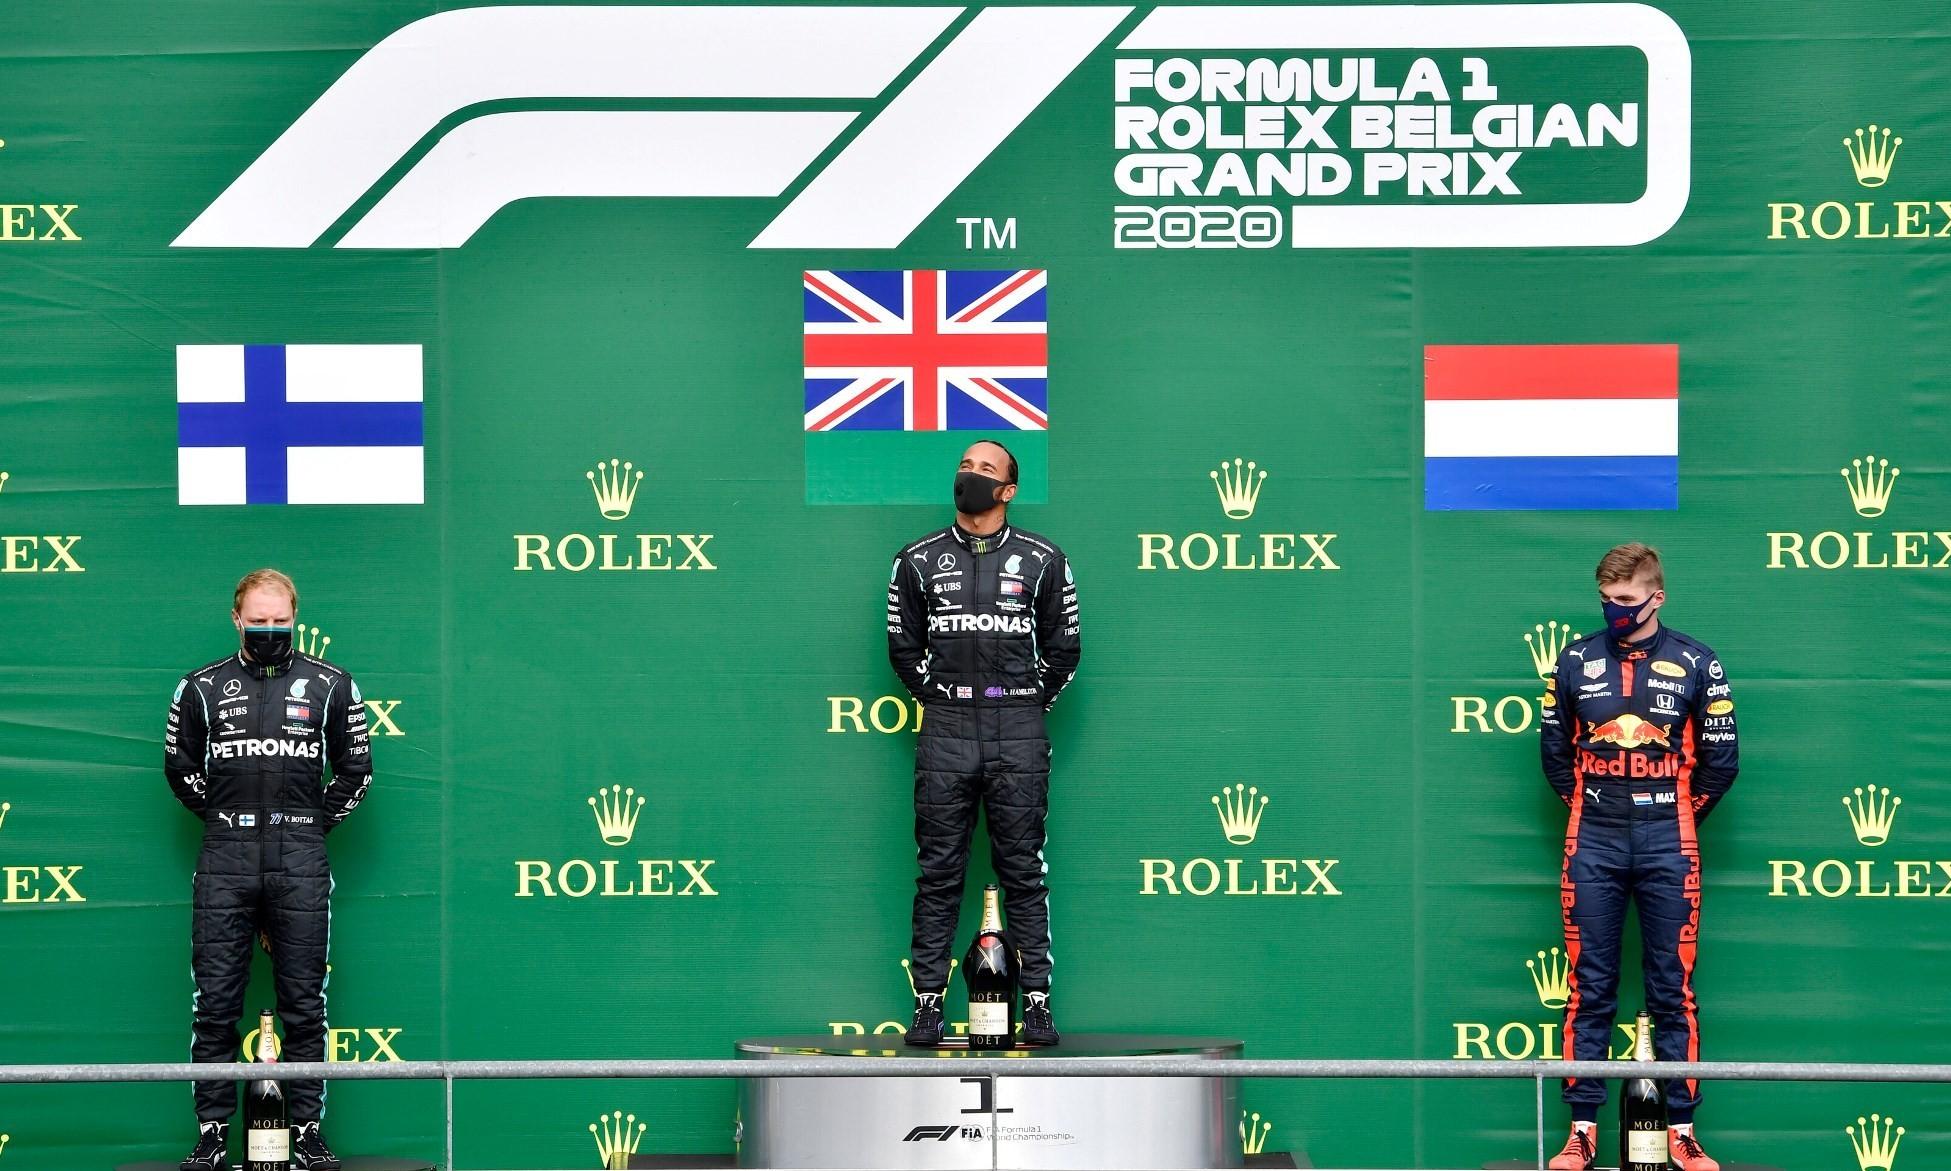 F1 Review Belgium 2020